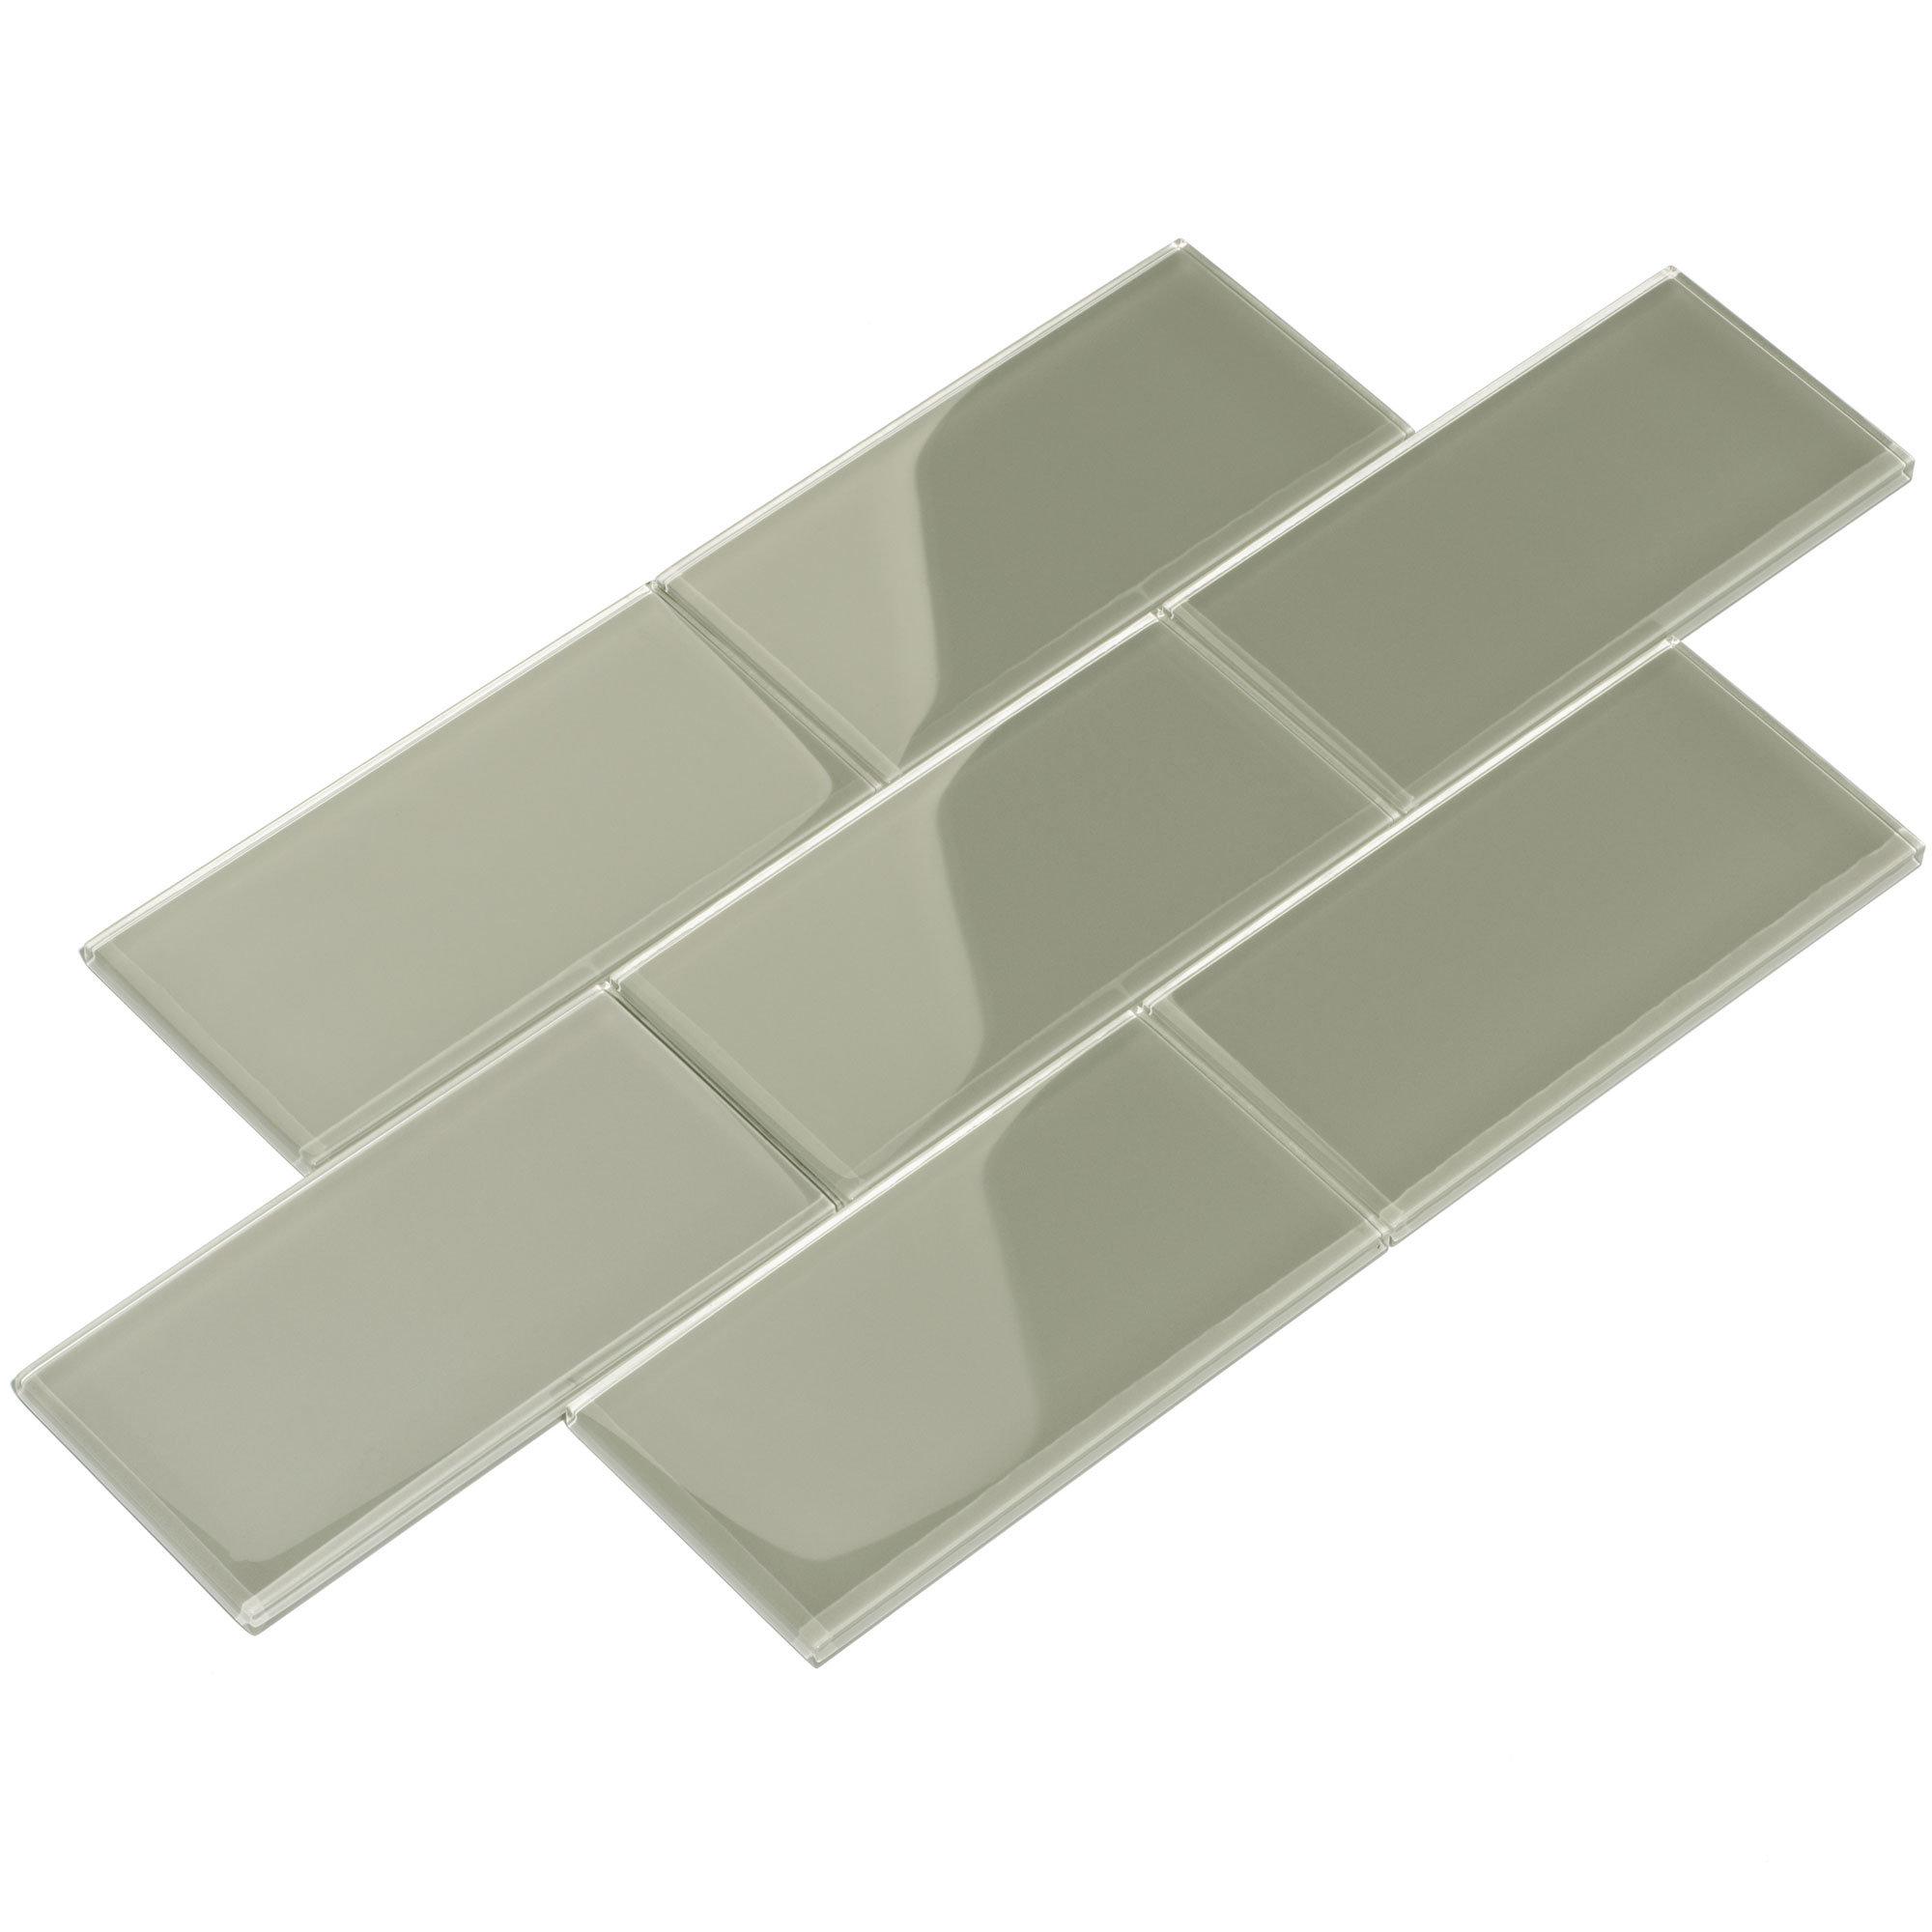 Giorbello 3 X 6 Glass Subway Tile In Light Gray Reviews Wayfair